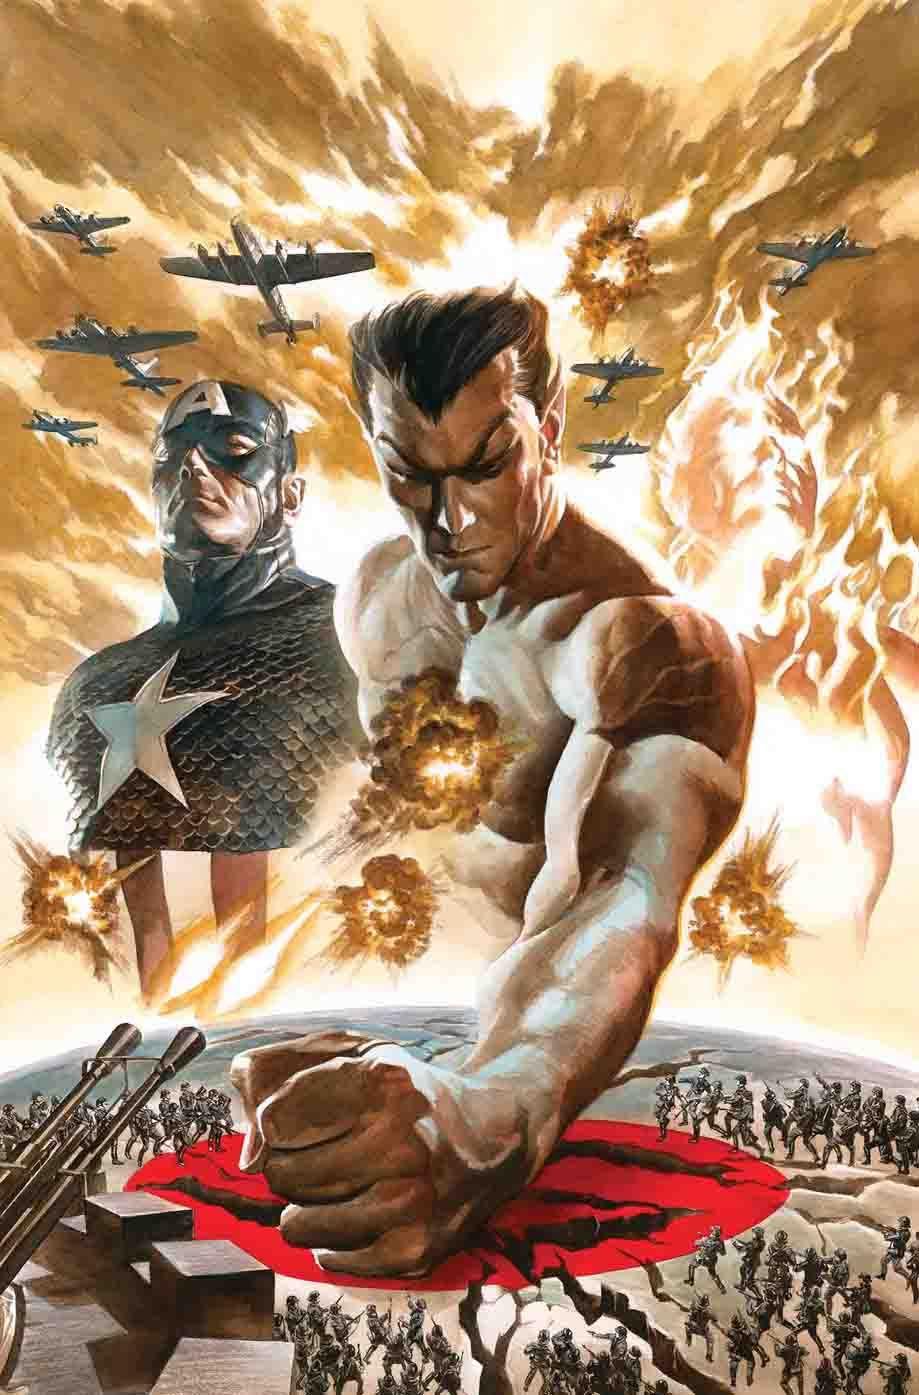 Namor The Sub-Mariner and the Invaders by Alex Ross | Arte da marvel, Banda  desenhada, Marvel comics